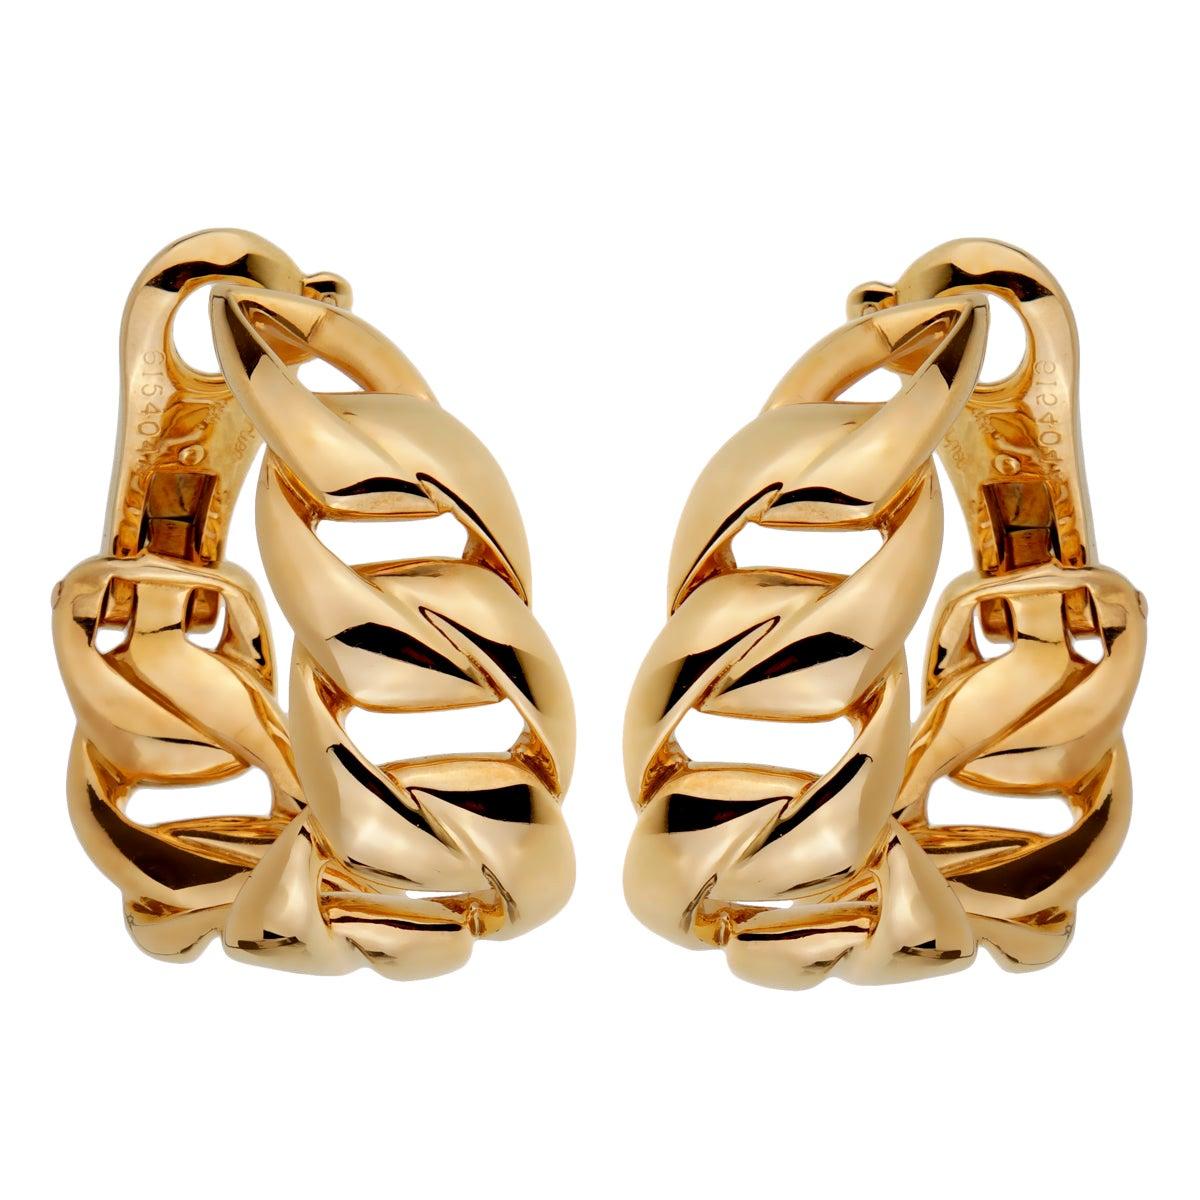 Cartier Chain Link Yellow Gold Hoop Earrings